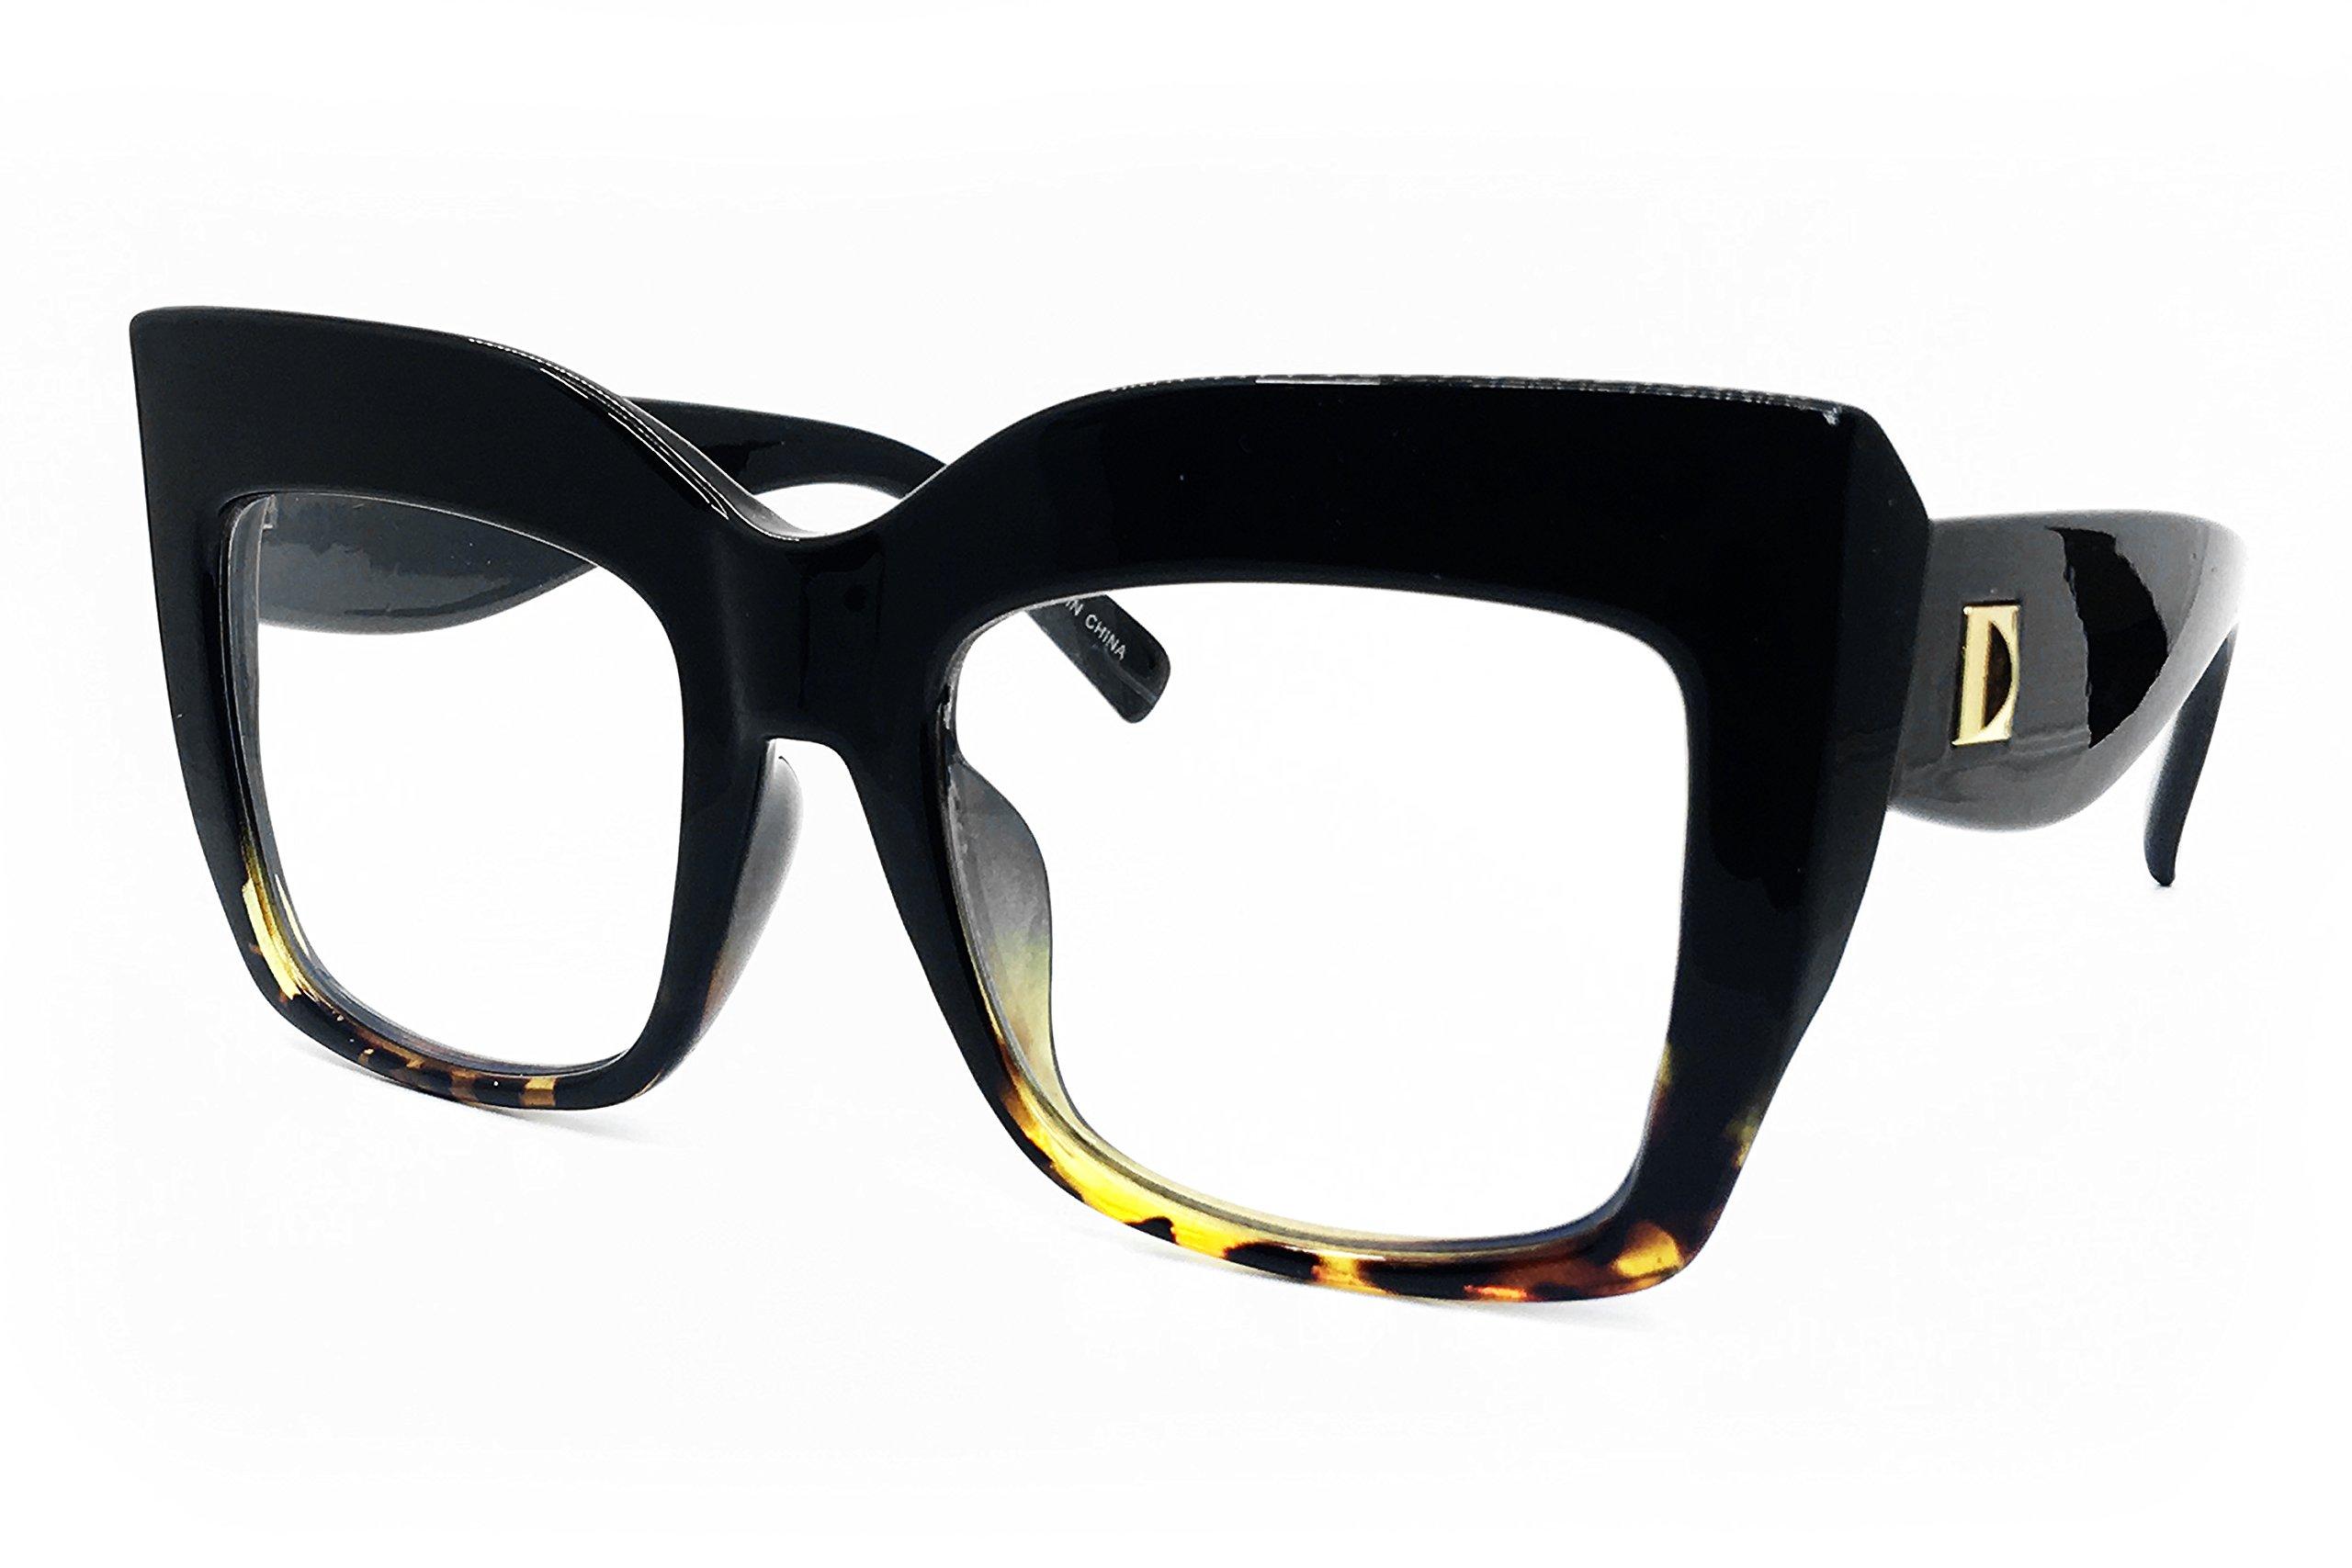 O2 Eyewear SA157 Premium Oversize XXL Women Cateye Brand Designer Square Style Thick Frame Shades Tilda Shadow Fashion Clear Sunglasses (BLACK BROWN/CLEAR, 57)